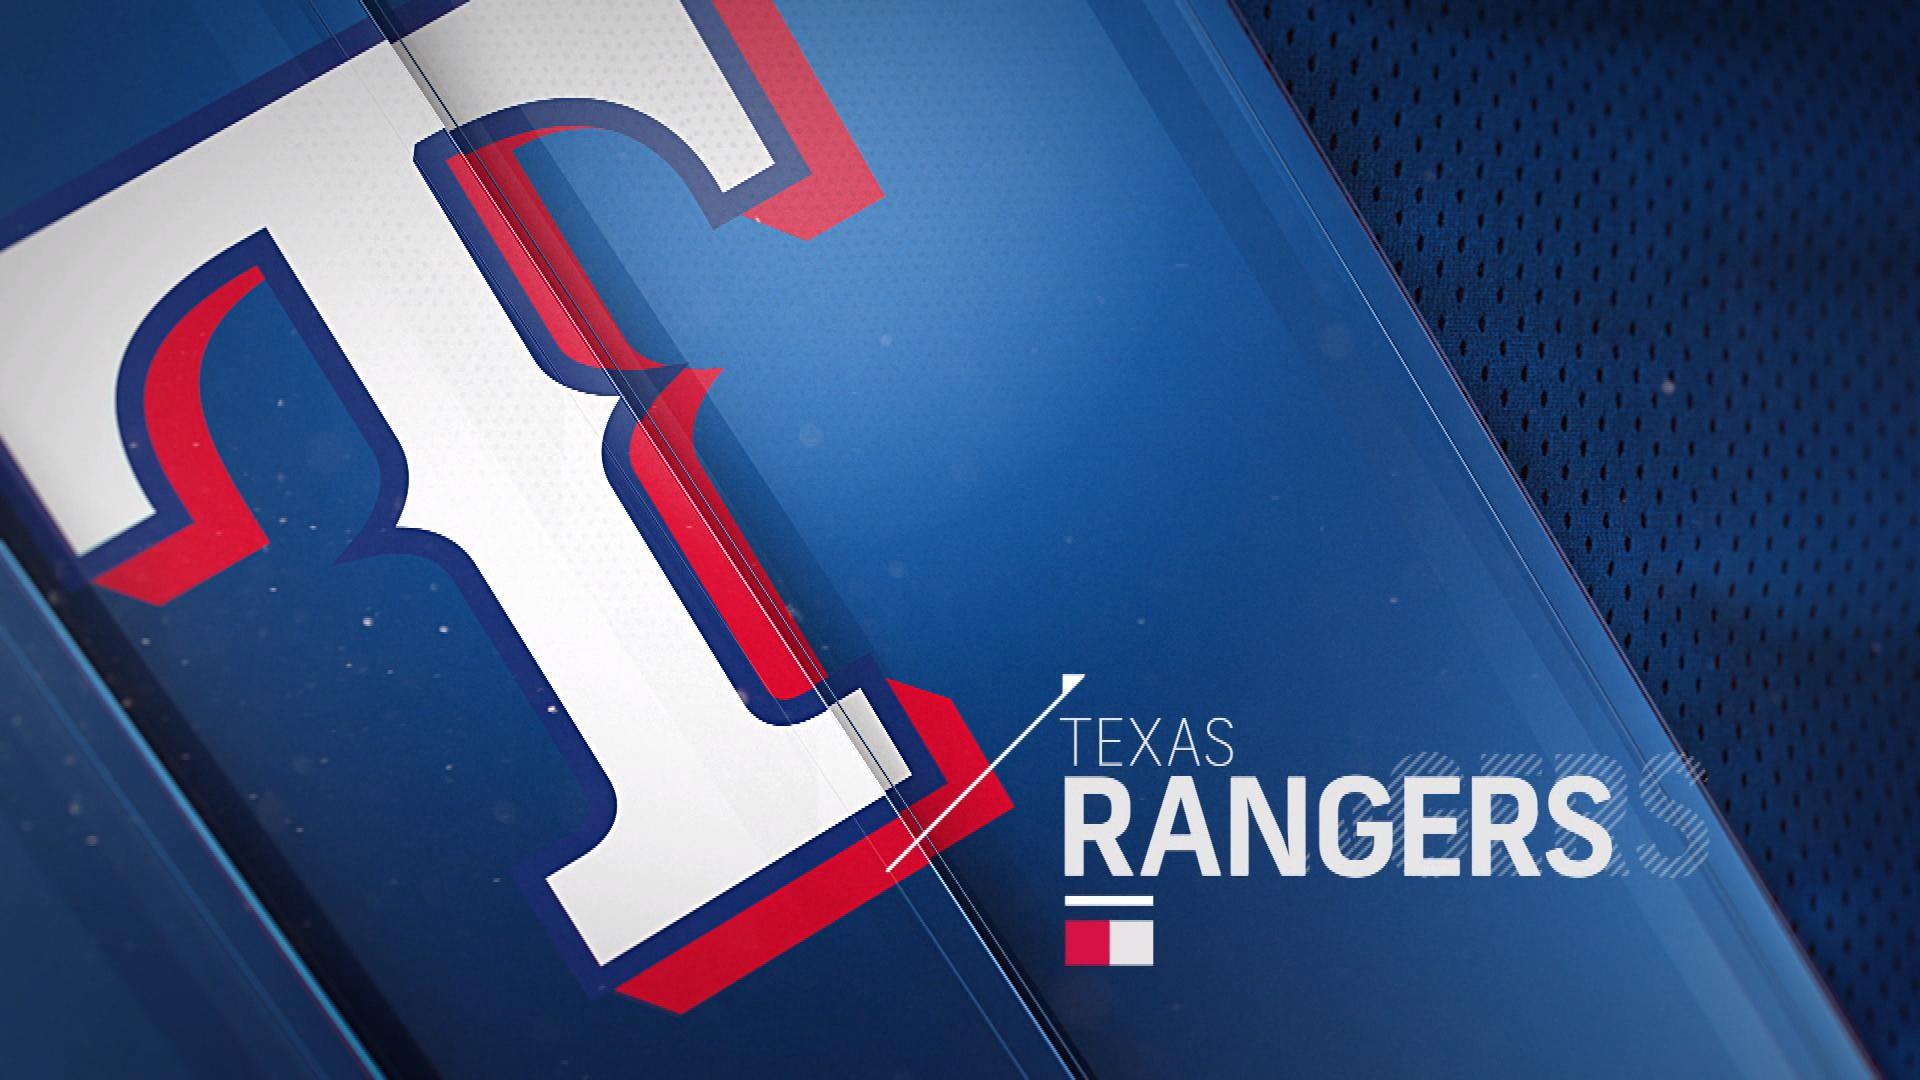 … wallpaper 6857080; texas rangers wallpapers b1gbaseball com …